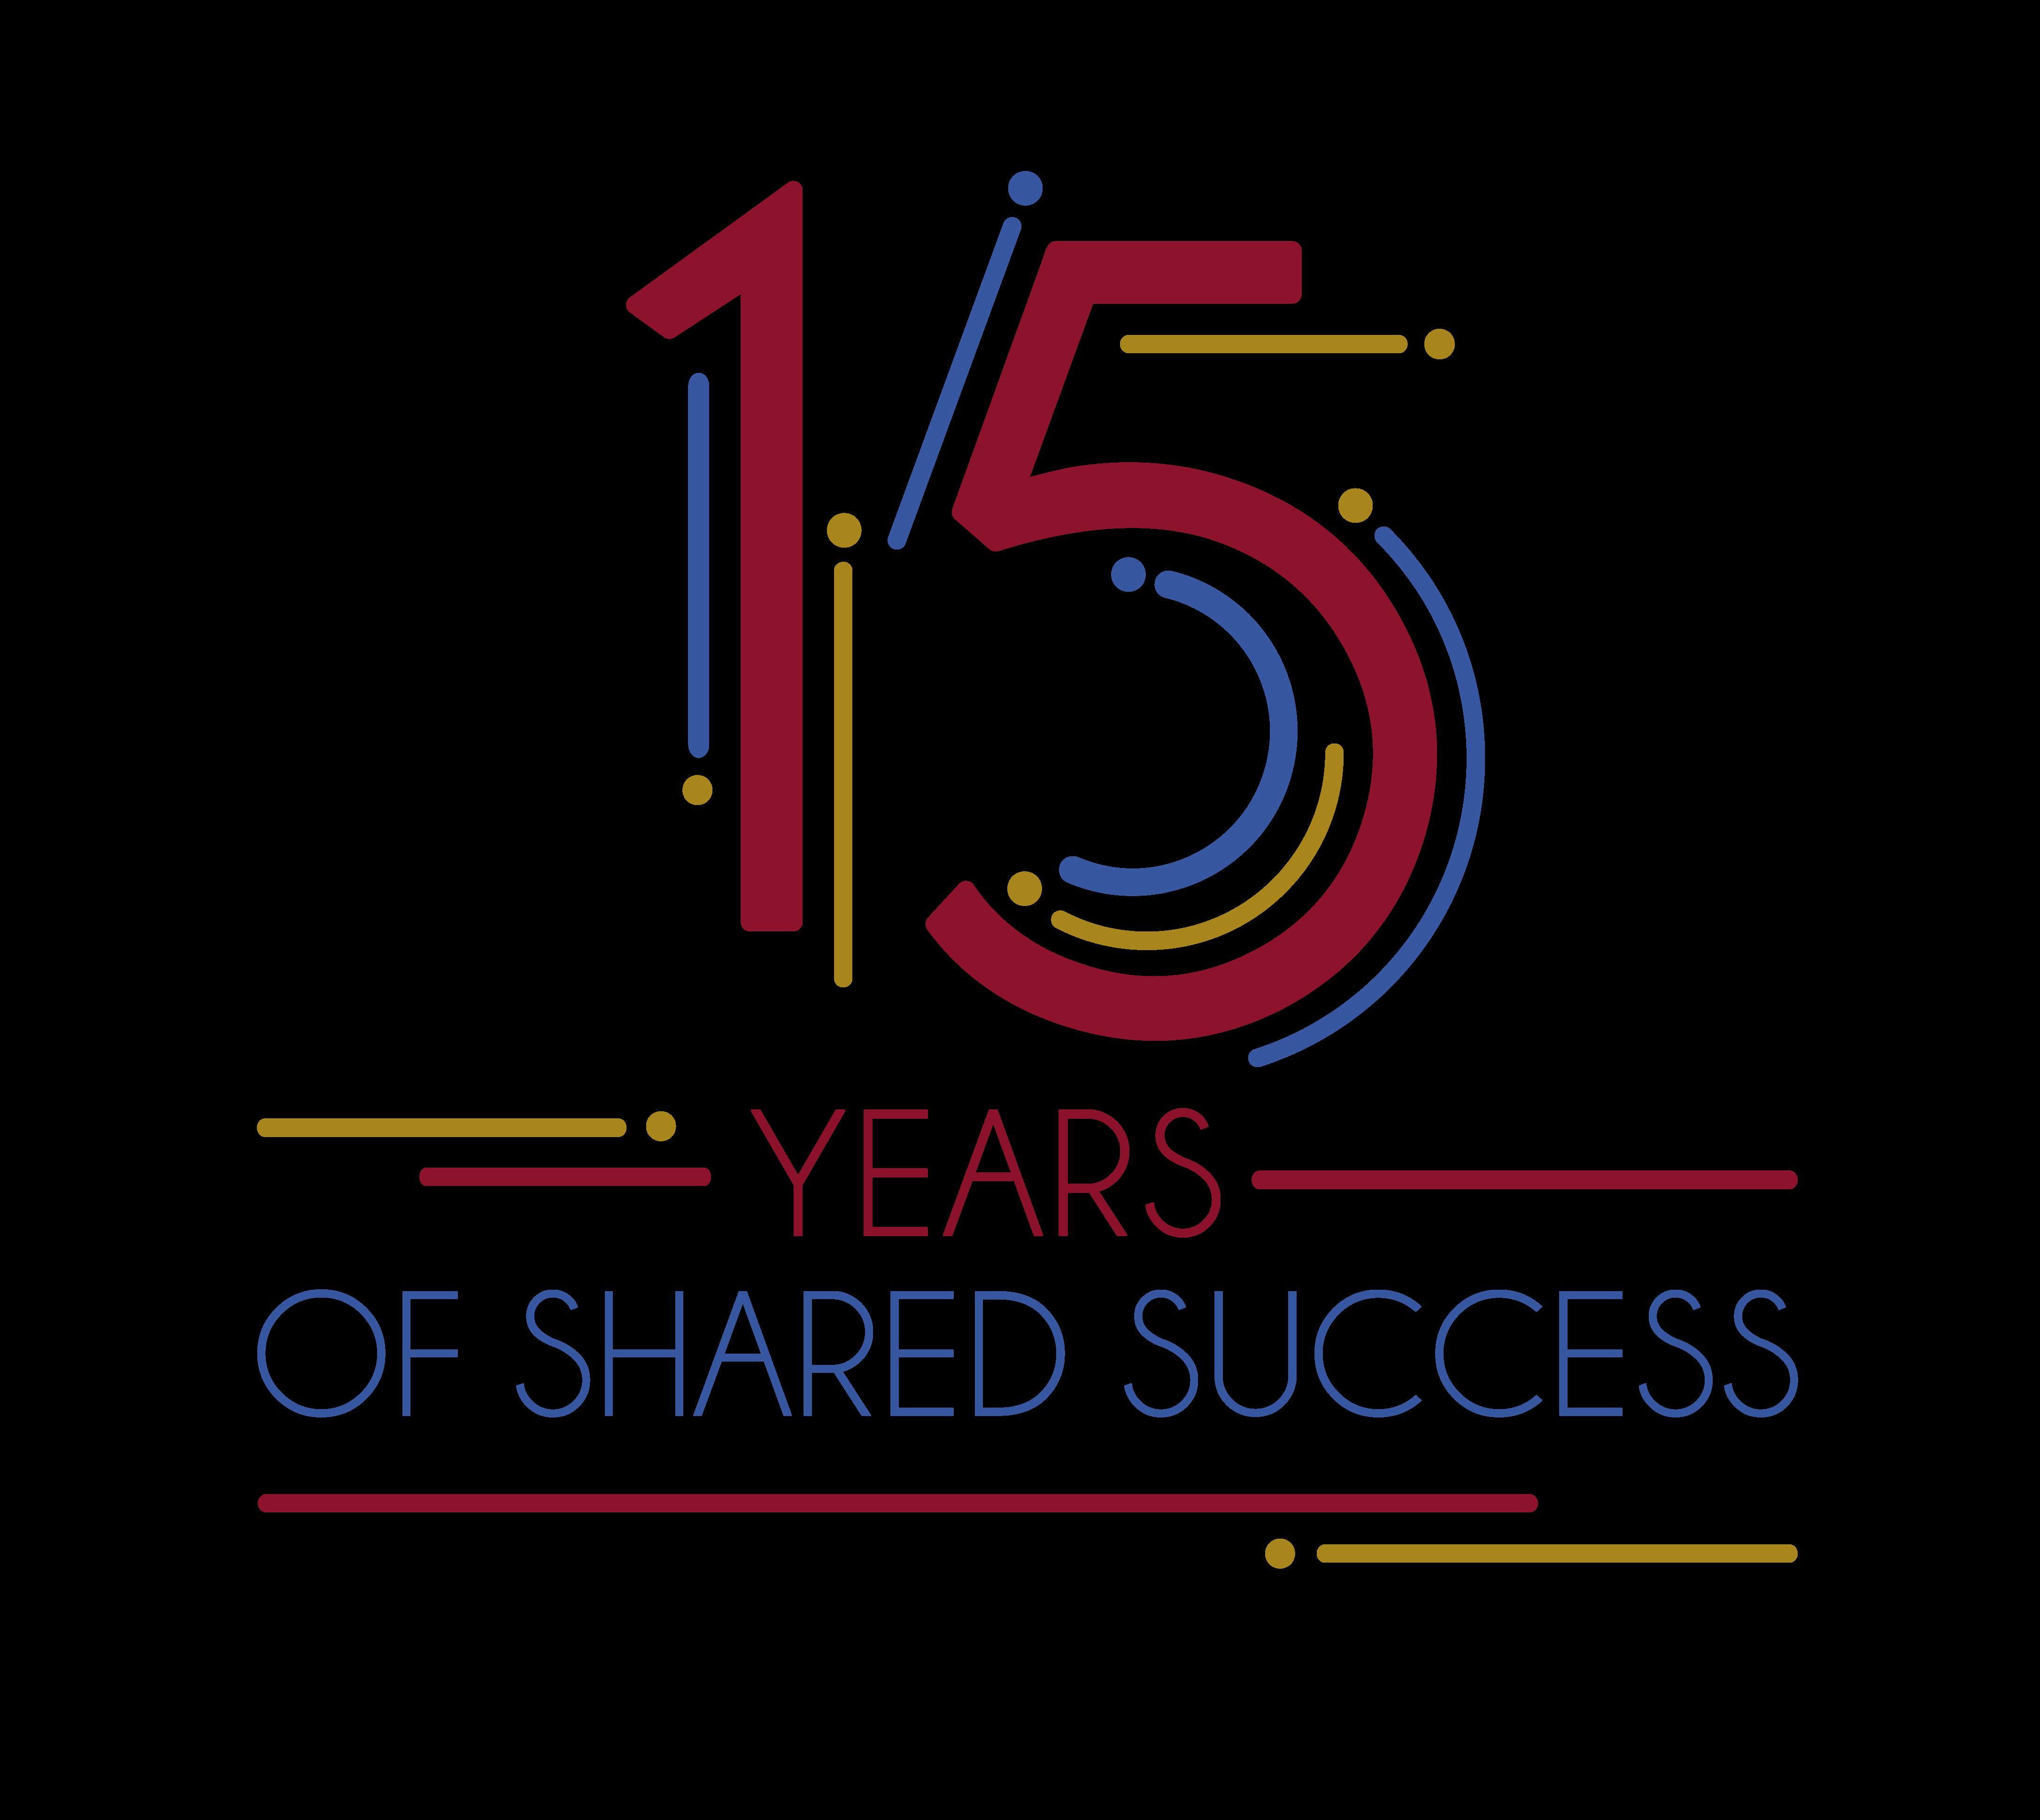 logo 15 Anniversary Alsachim